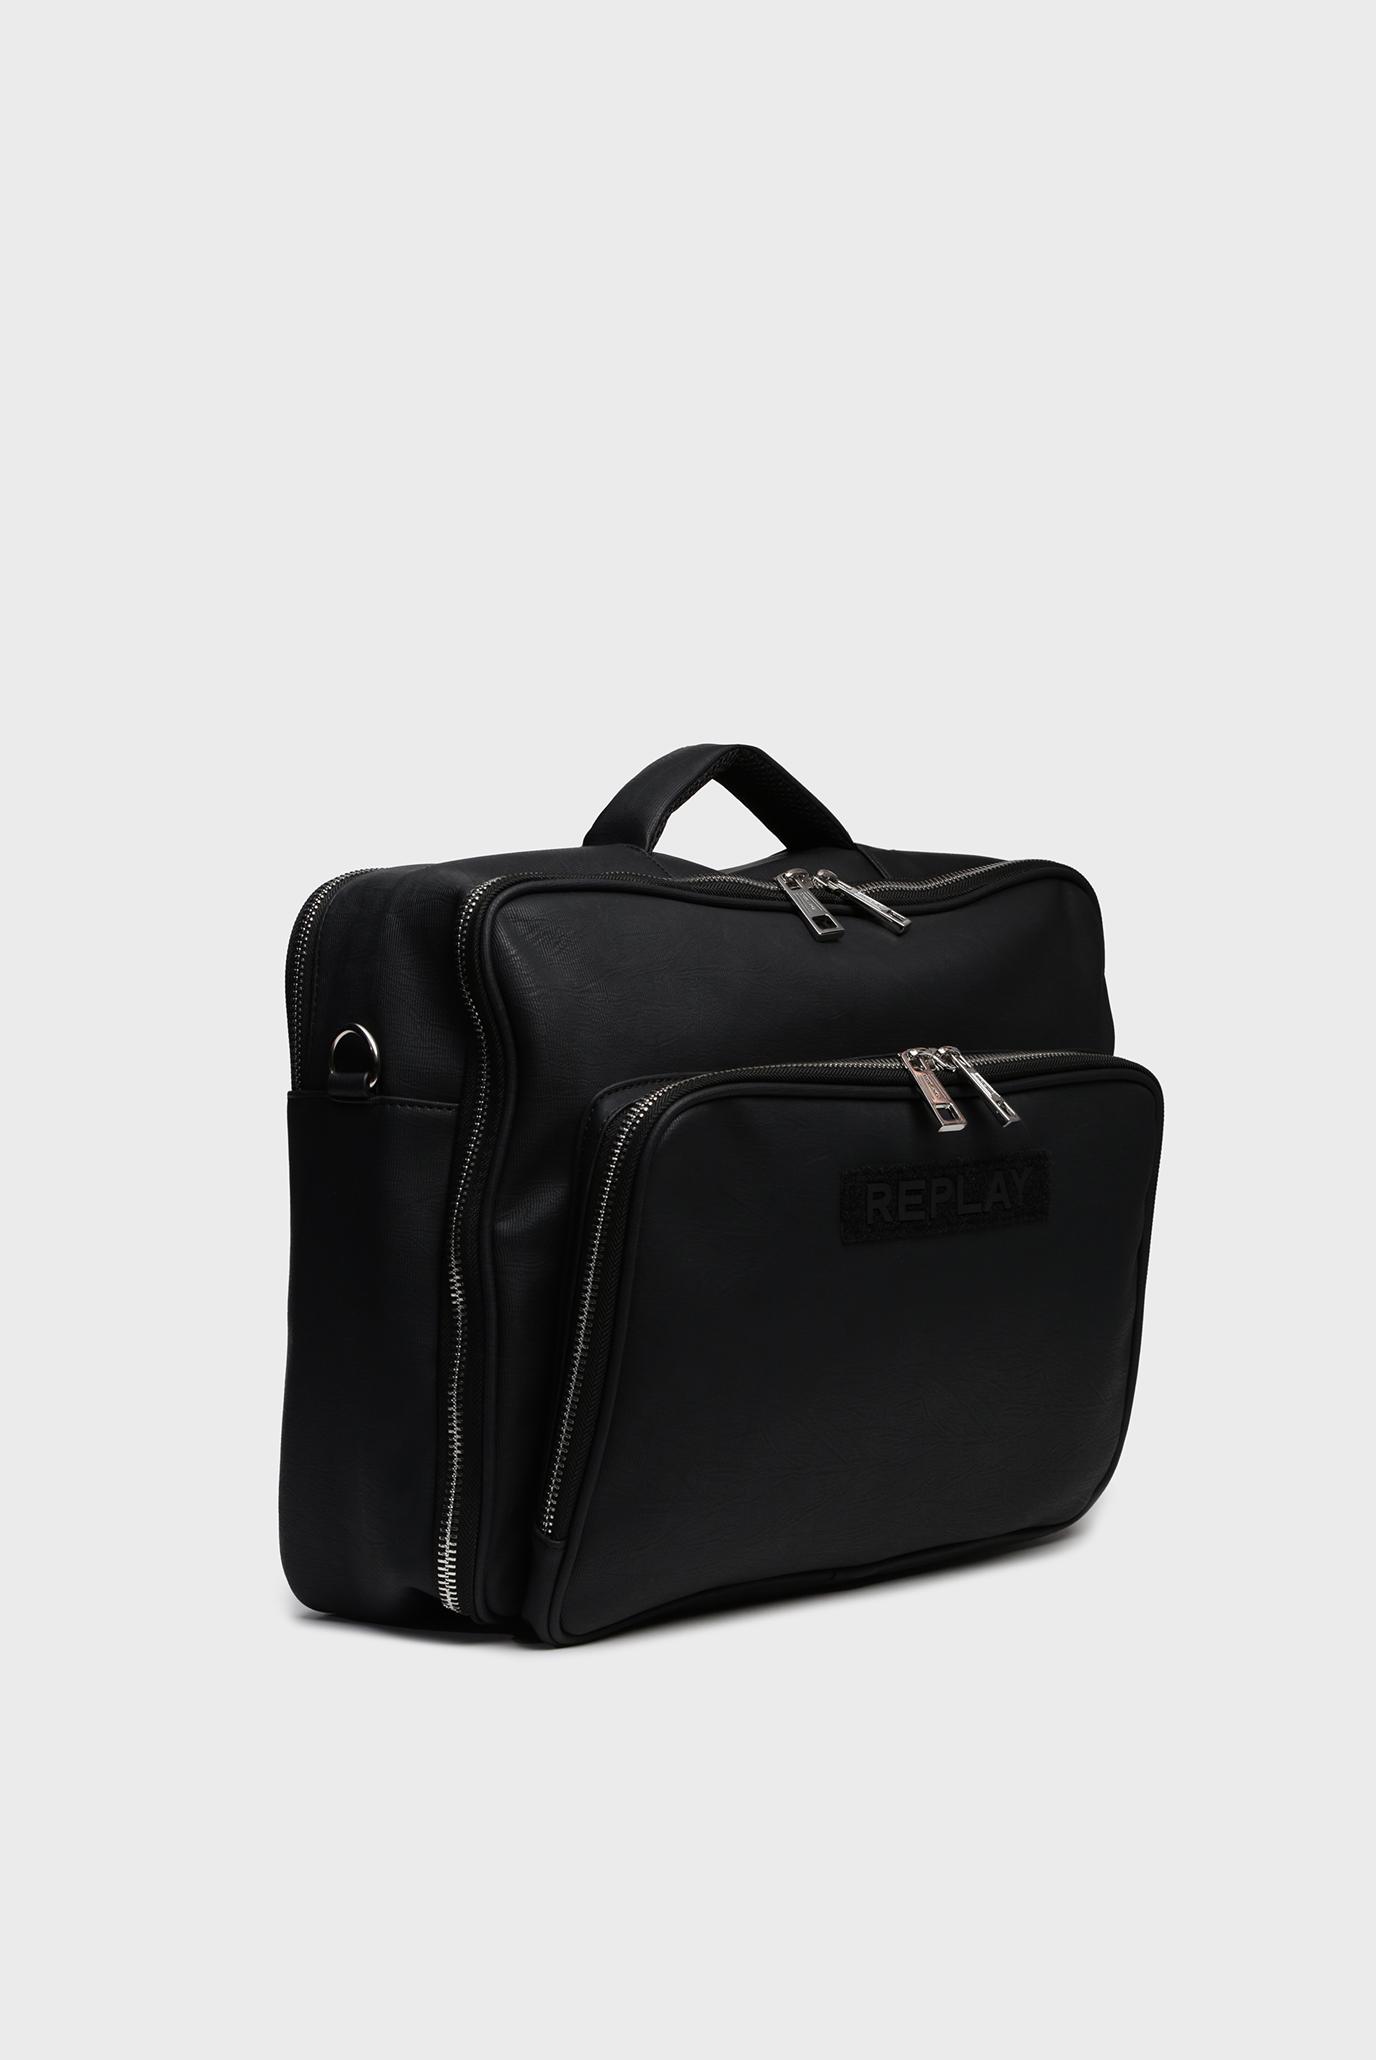 Мужская черная дорожная сумка Replay